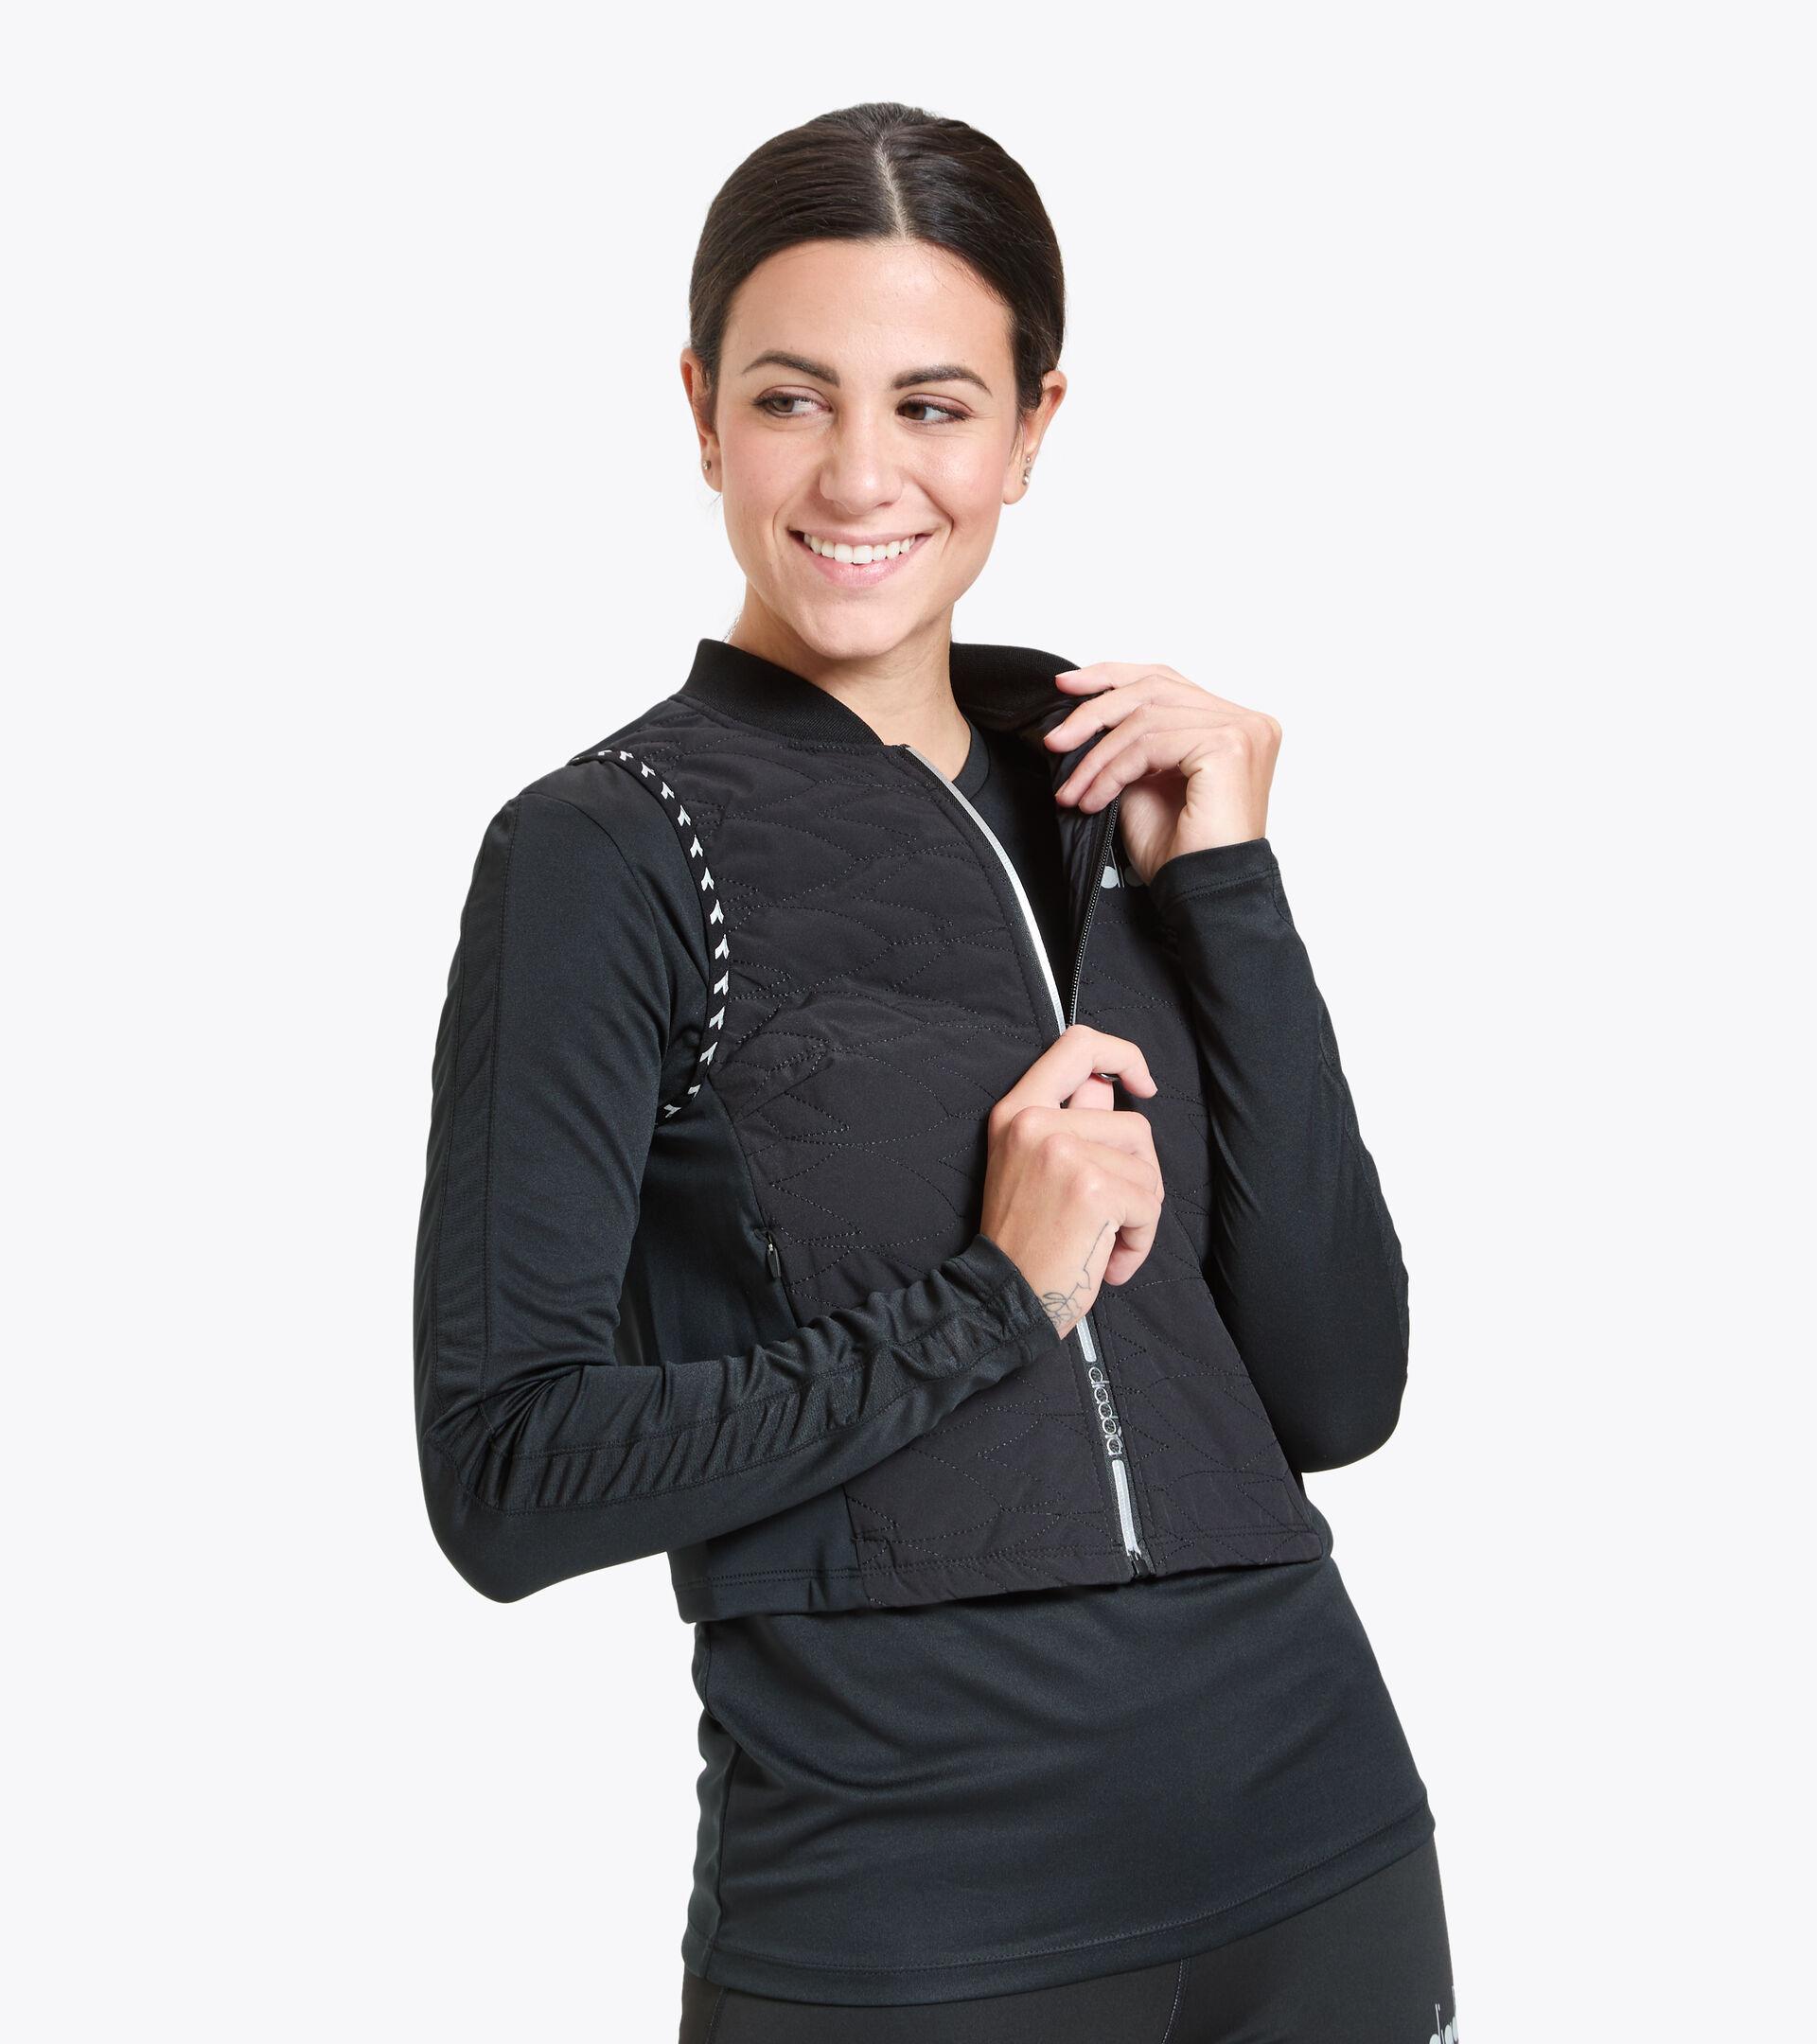 Gilet antivento da running - Donna L. URBAN VEST BE ONE NERO - Diadora